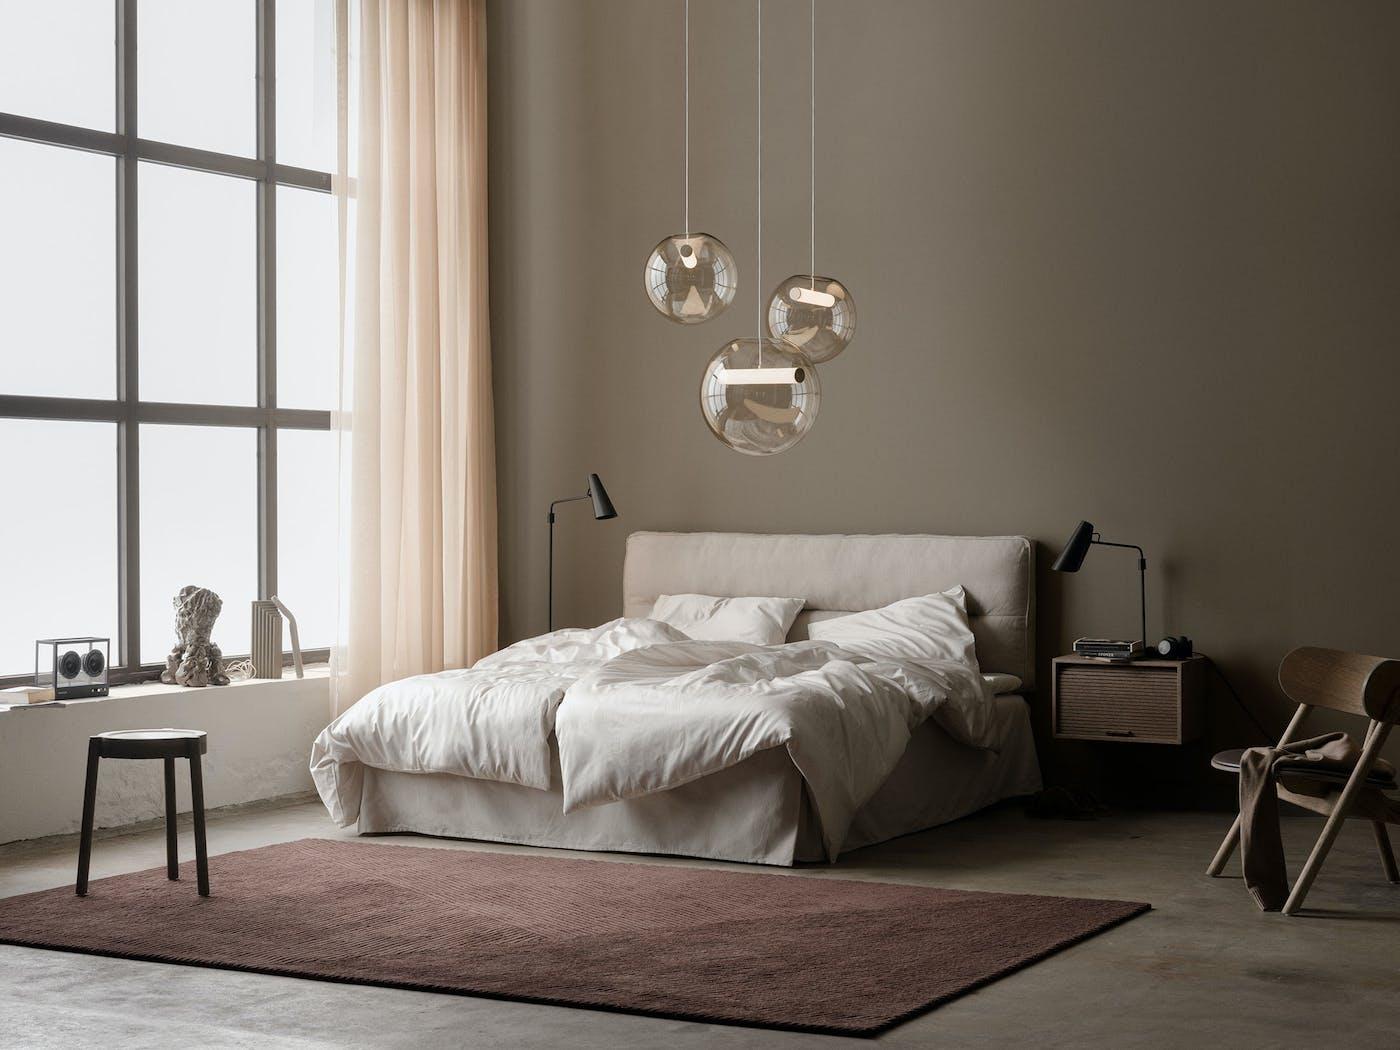 Reveal pendant group Birdy Row bedroom Northern Photo Einar Aslaksen Low res